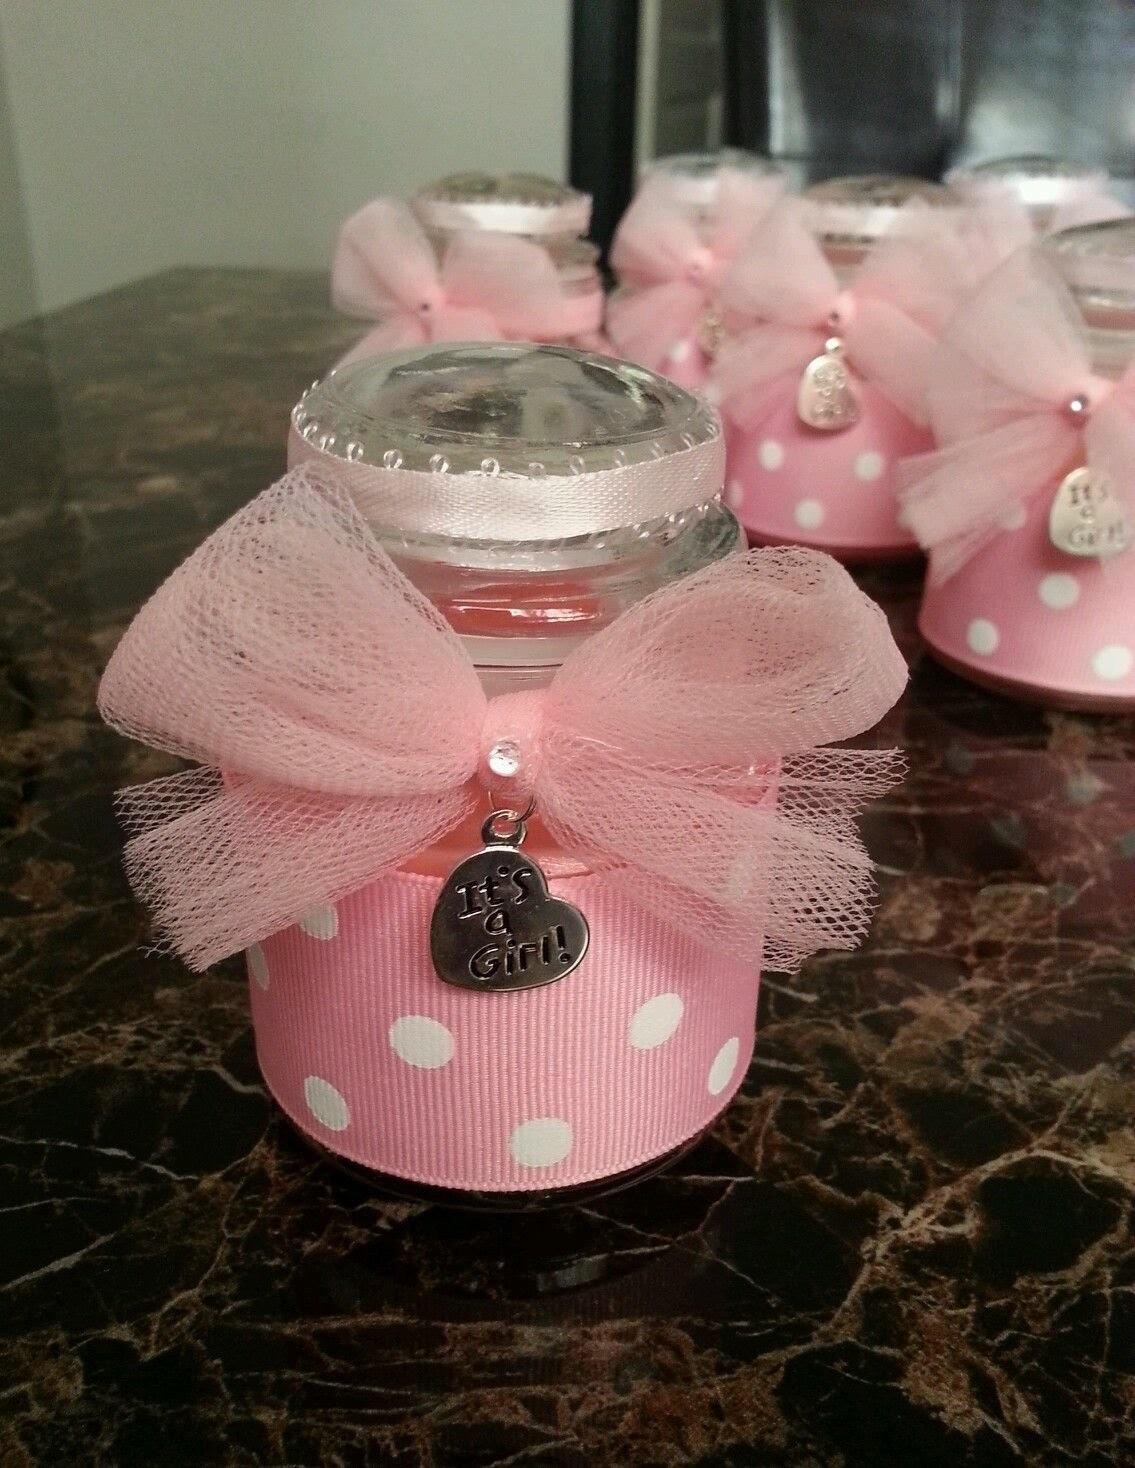 Recuerdos de Velas con Tapa Para Baby Shower, Bodas, Quinceaneras, Cumpleanos o Bautizos